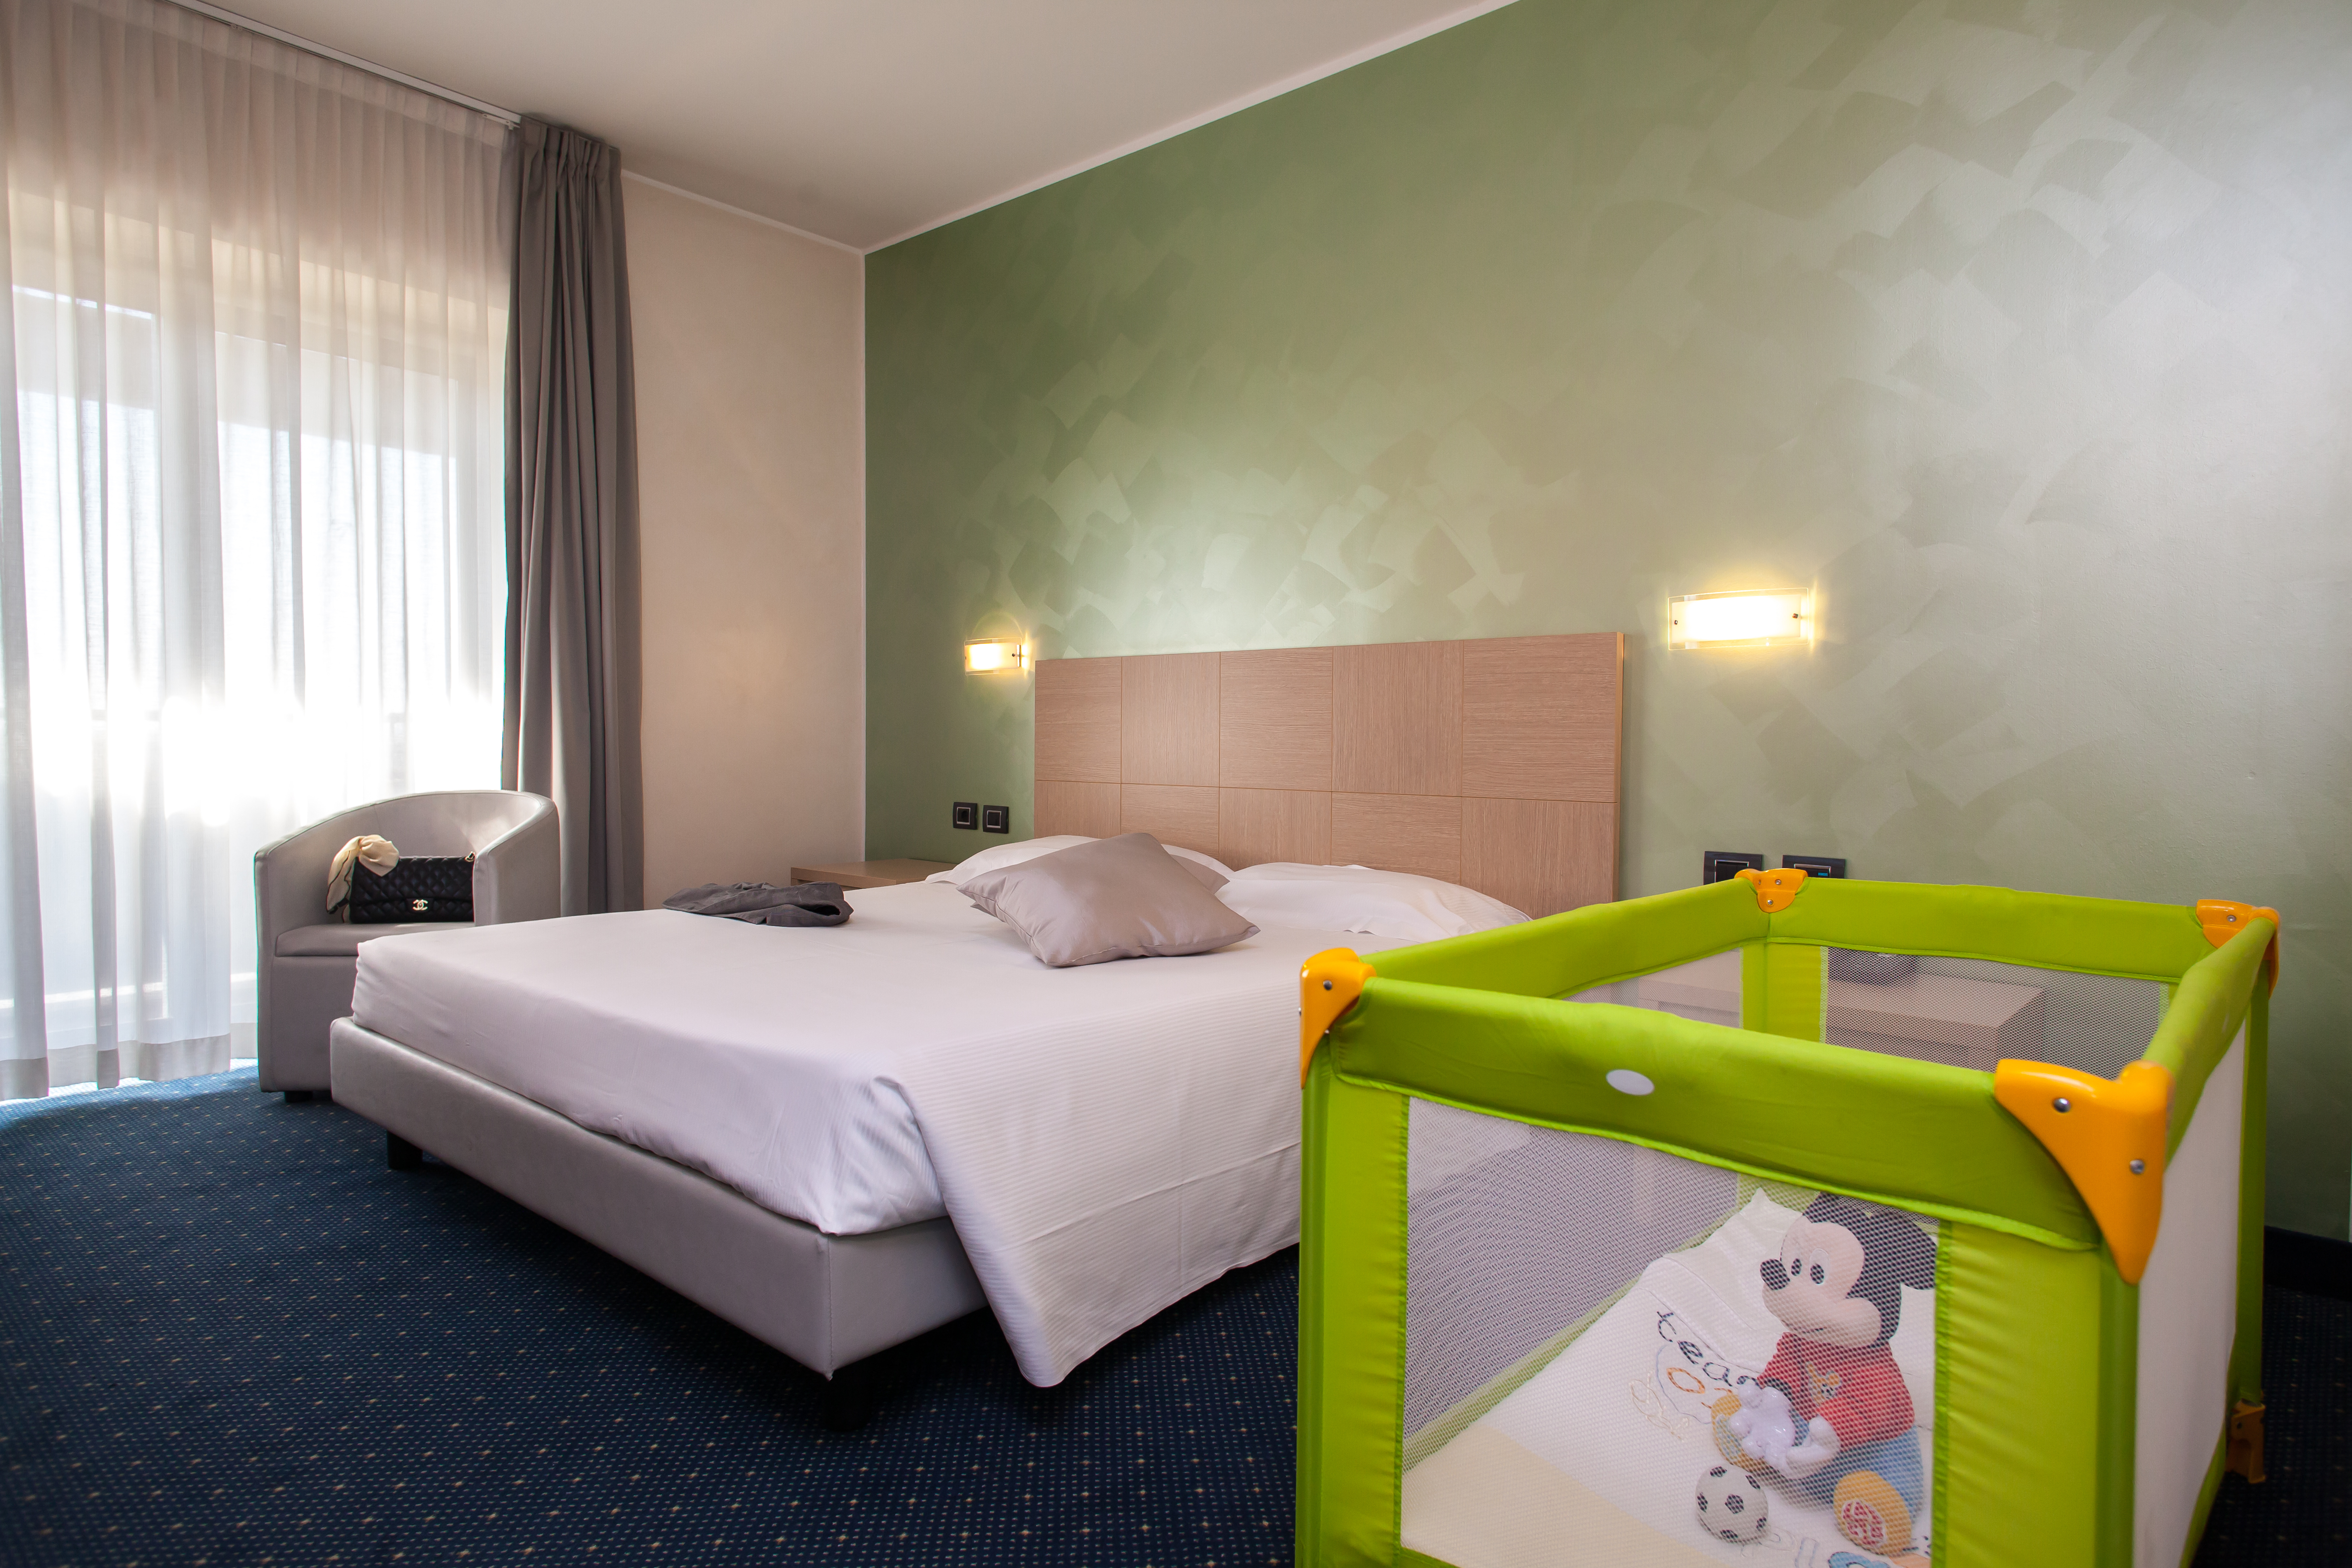 Palace_Hotel_025